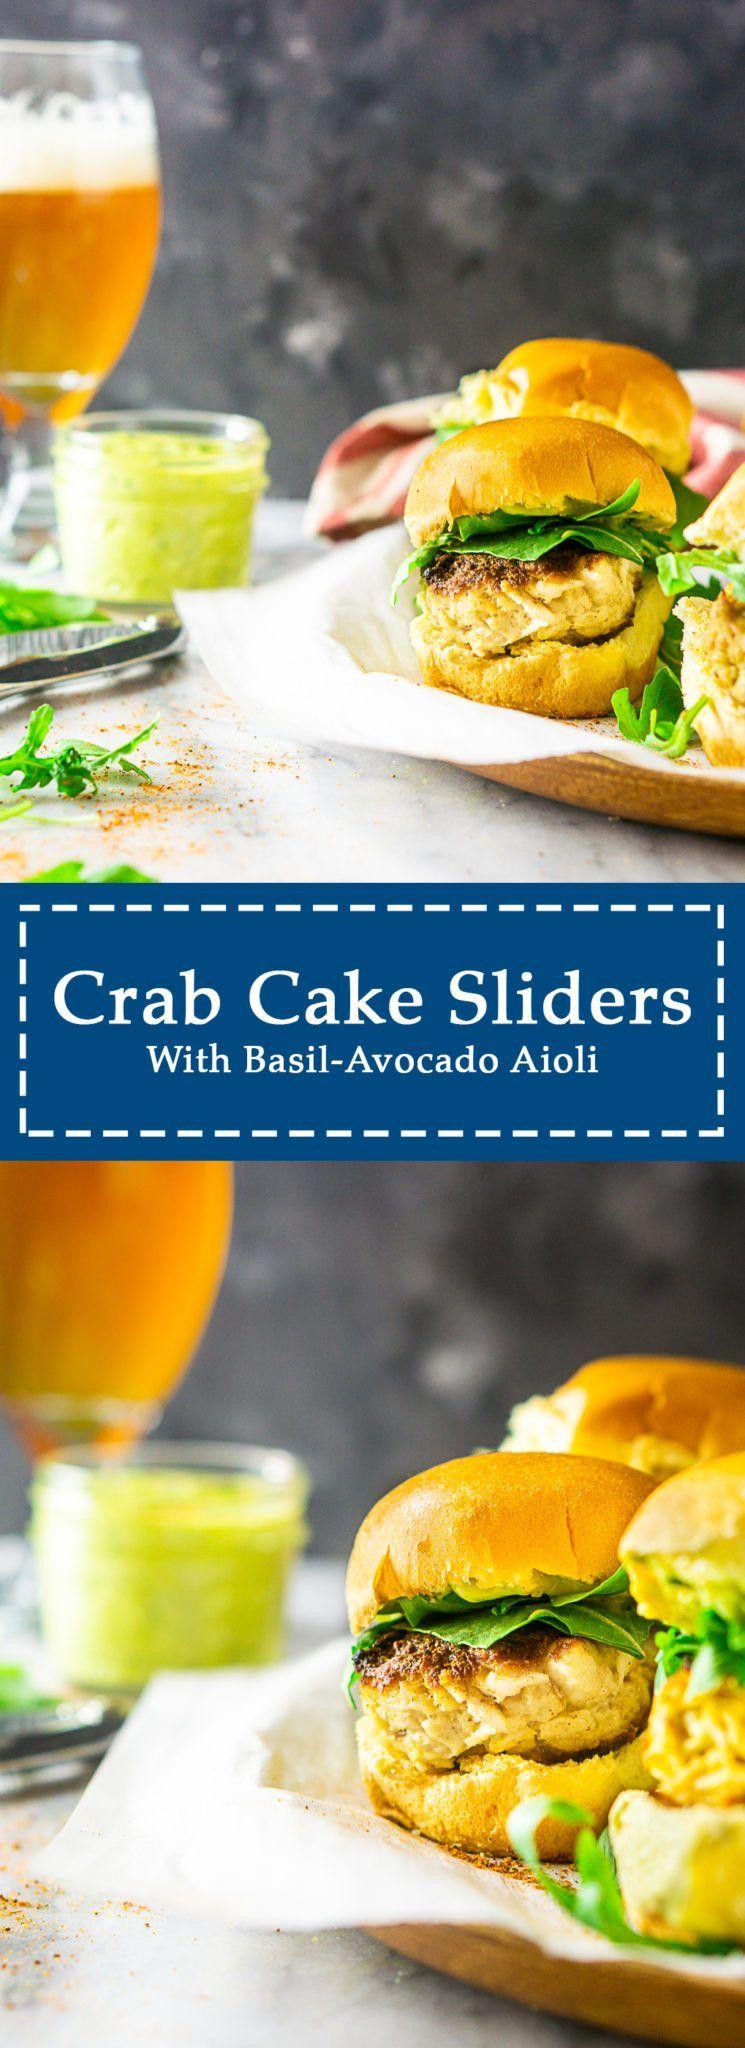 Crab cake sliders with basilavocado aioli recipe crab